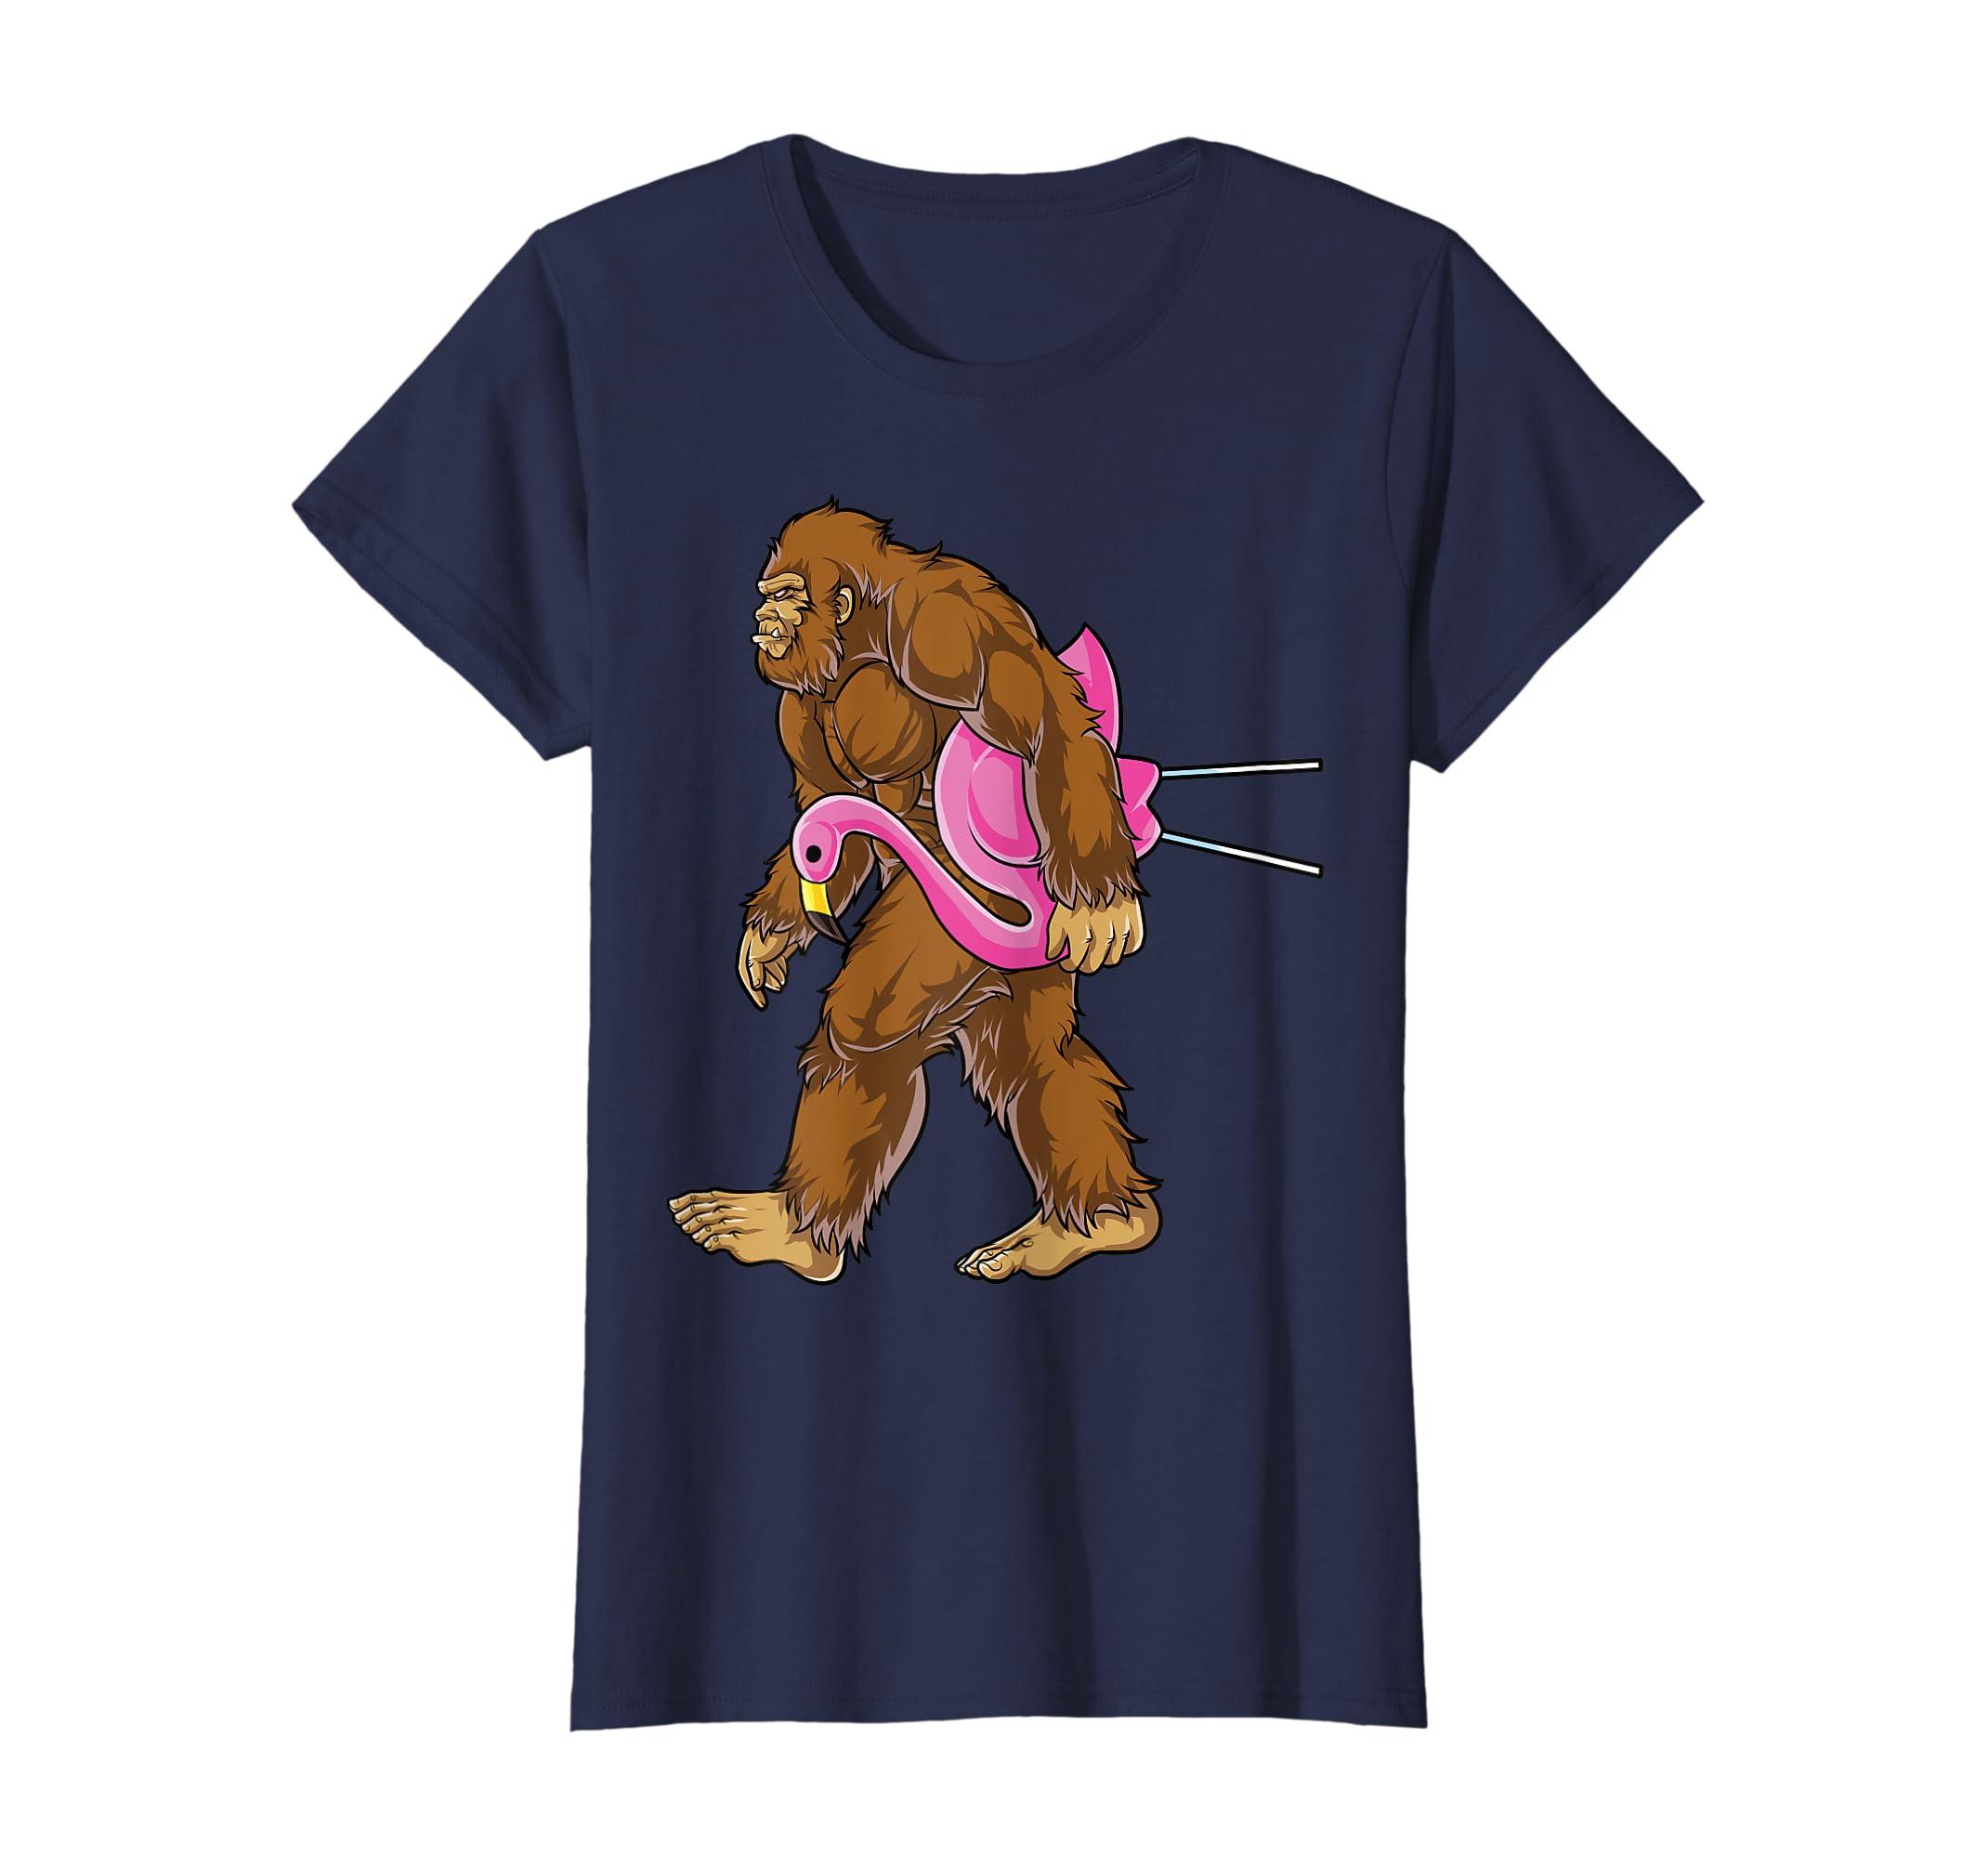 5c943692 Amazon.com: Bigfoot Carrying Lawn Flamingo T Shirt Funny Sasquatch Tees:  Clothing